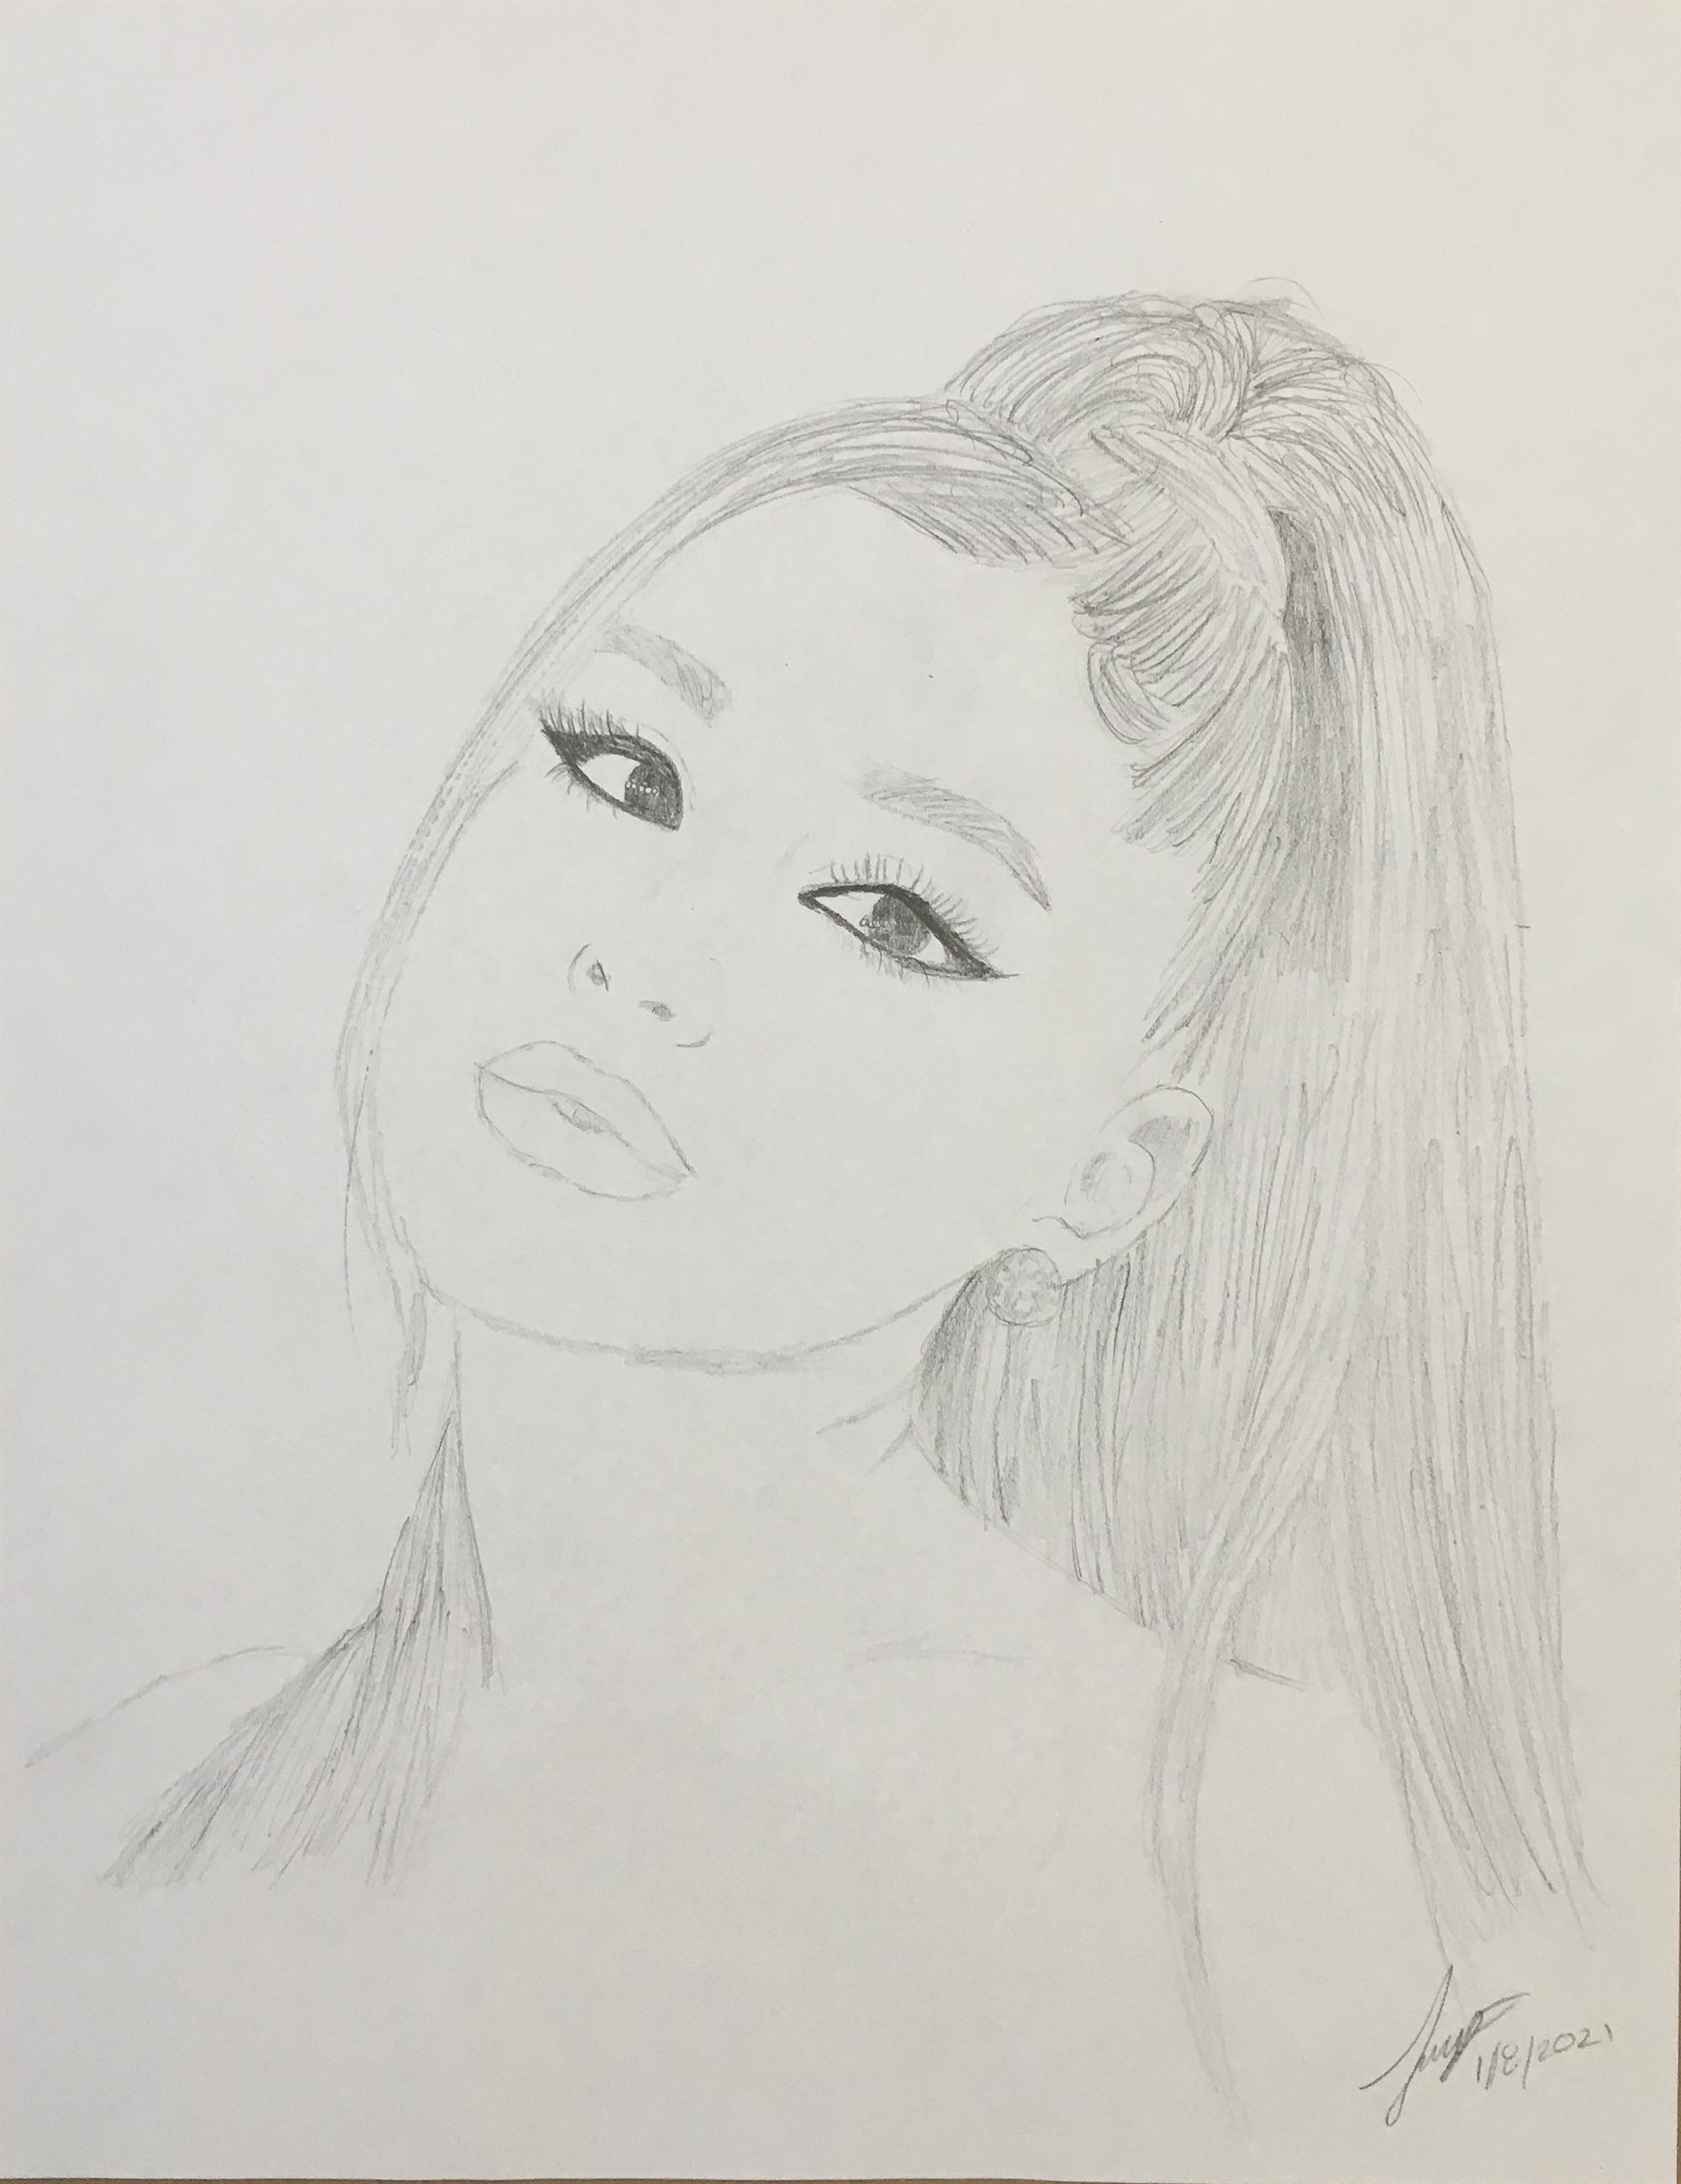 2nd. Tamar Parker, Pencil Drawing of Ariana Grande